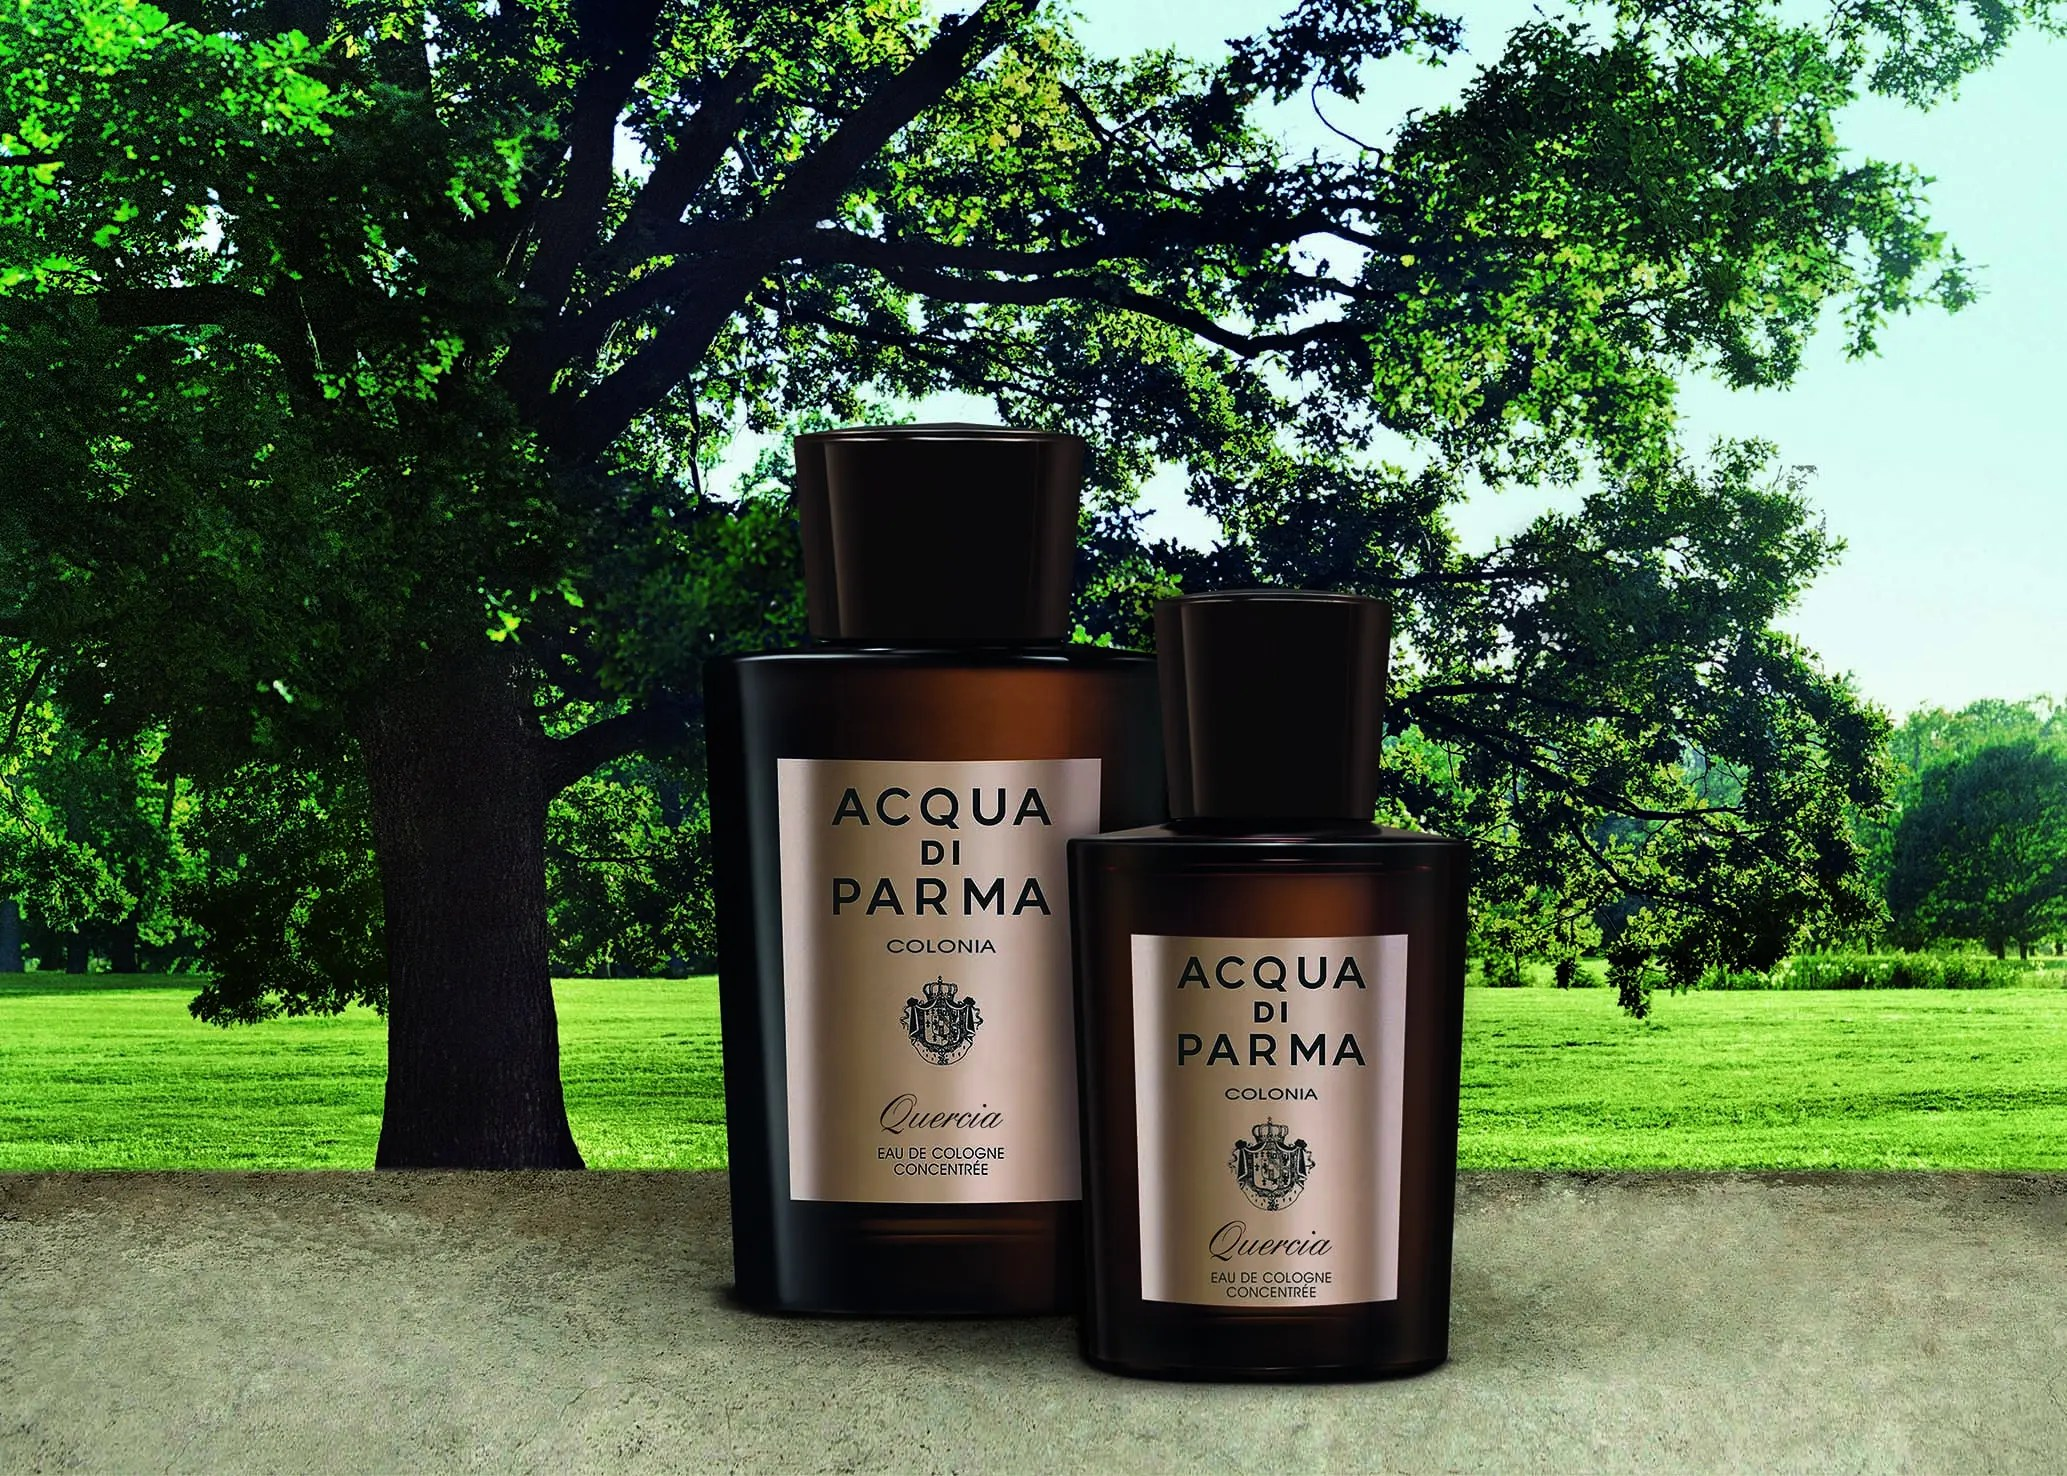 Acqua di Parma Colonia Quercia - Ape to Gentleman